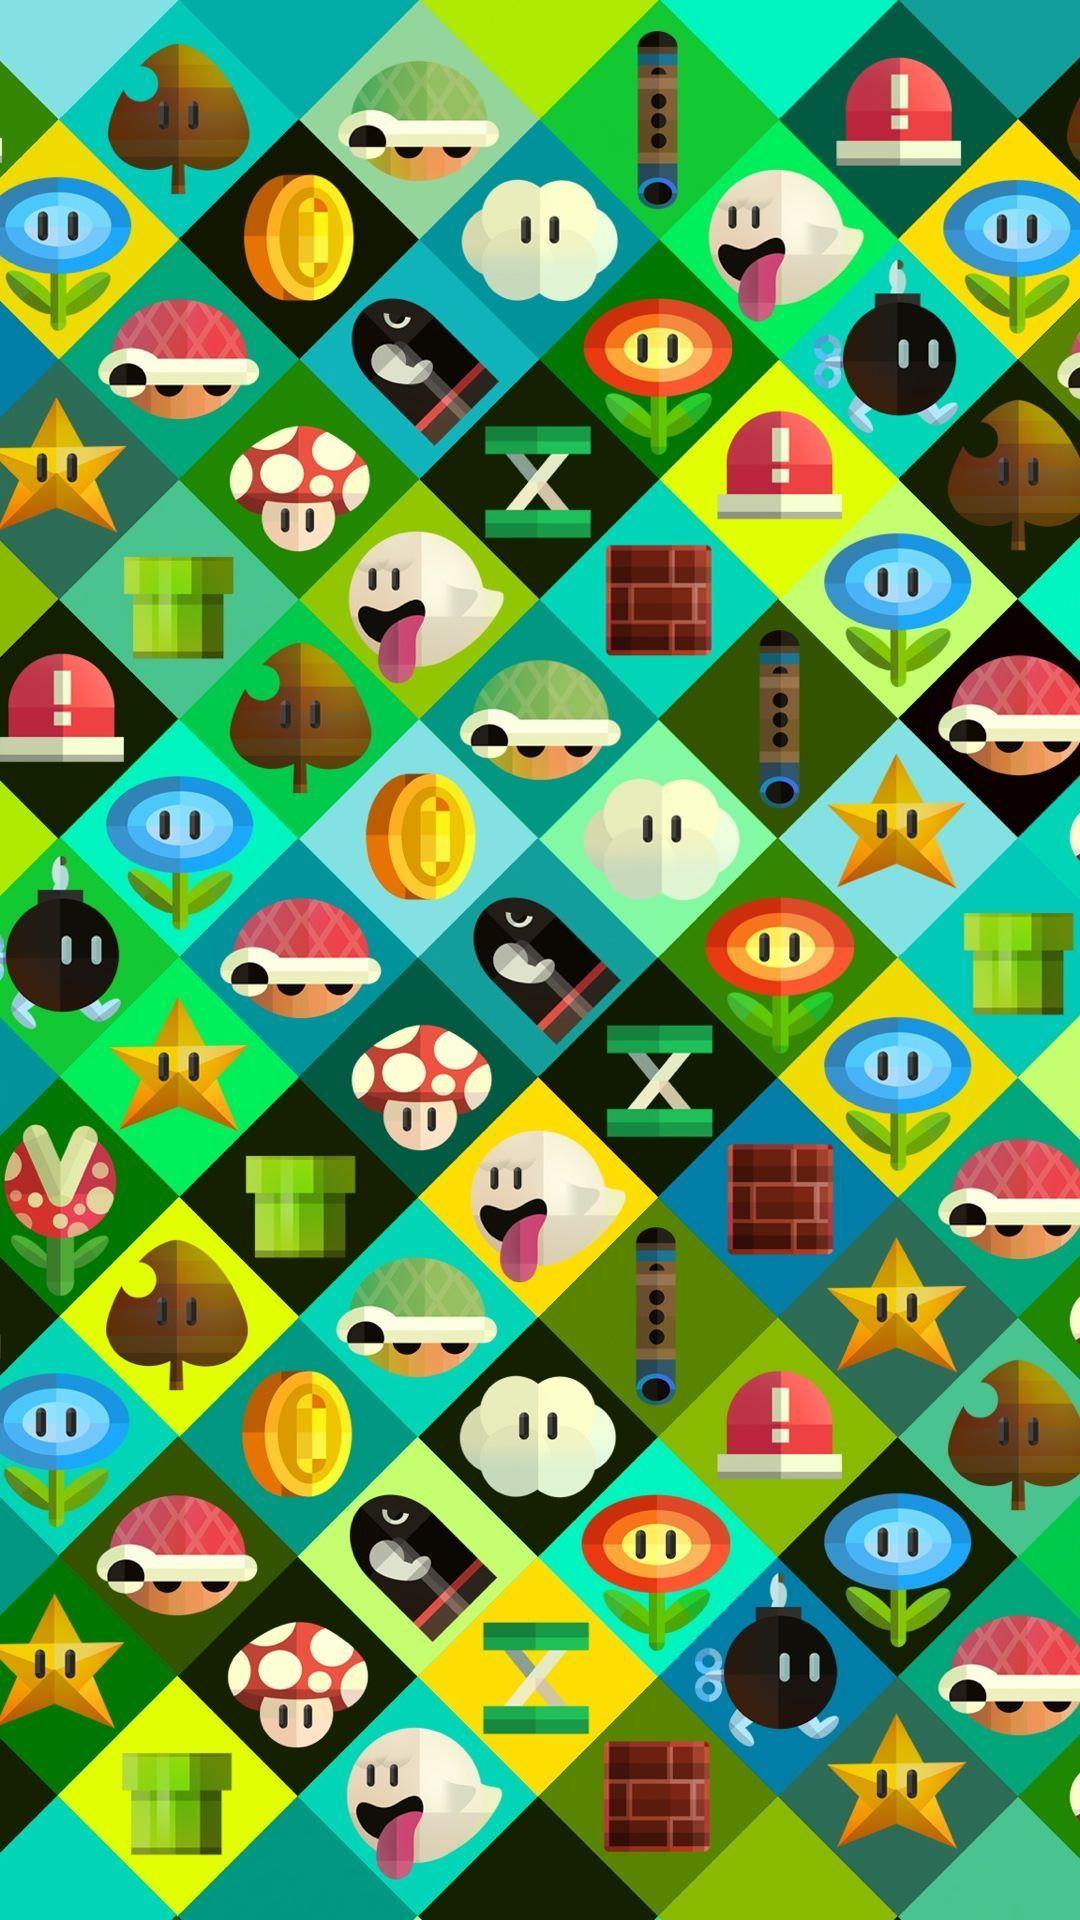 [iPhone wallpaper] Super Mario characters Wallpaper